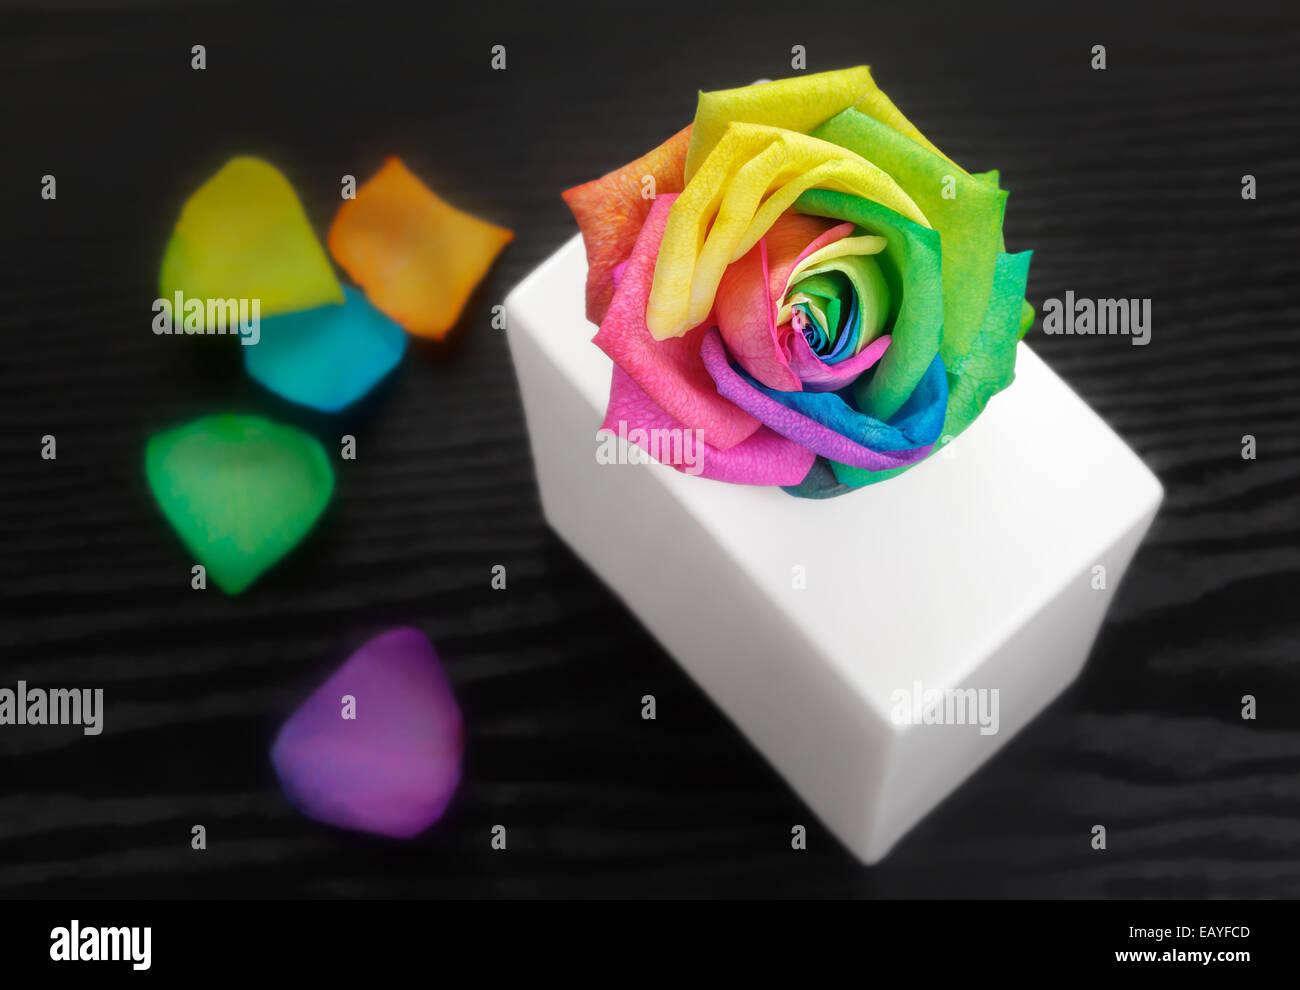 Multicolored Rose - Stock Image